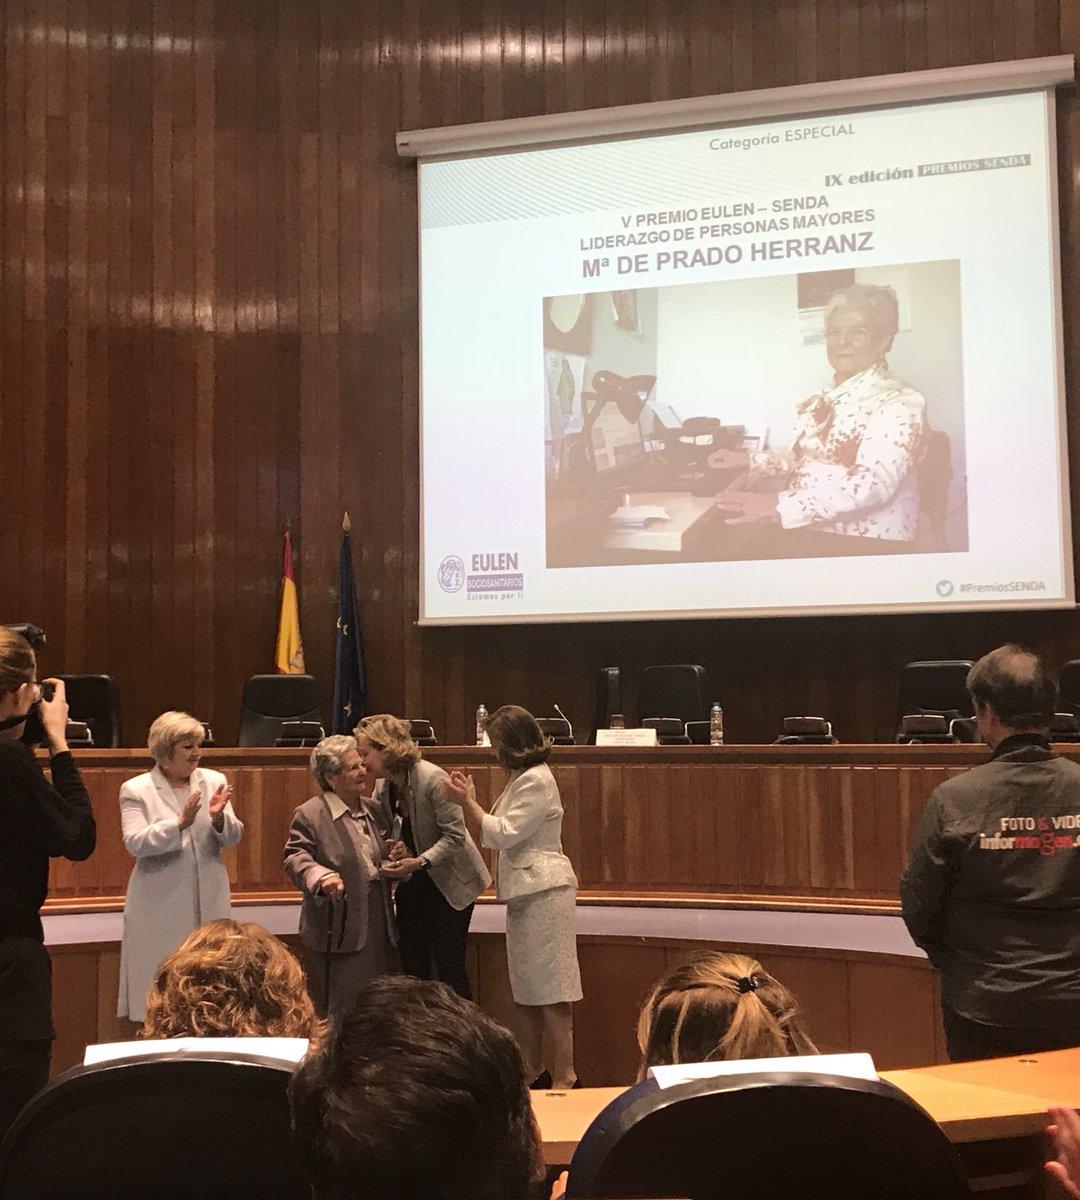 test Twitter Media - Natalia Roldán #EulenSociosanitarios entrega el Premio Liderazgo de Personas Mayores a Mª de Prado Herranz #PremiosSENDA https://t.co/BCjNByaQNA